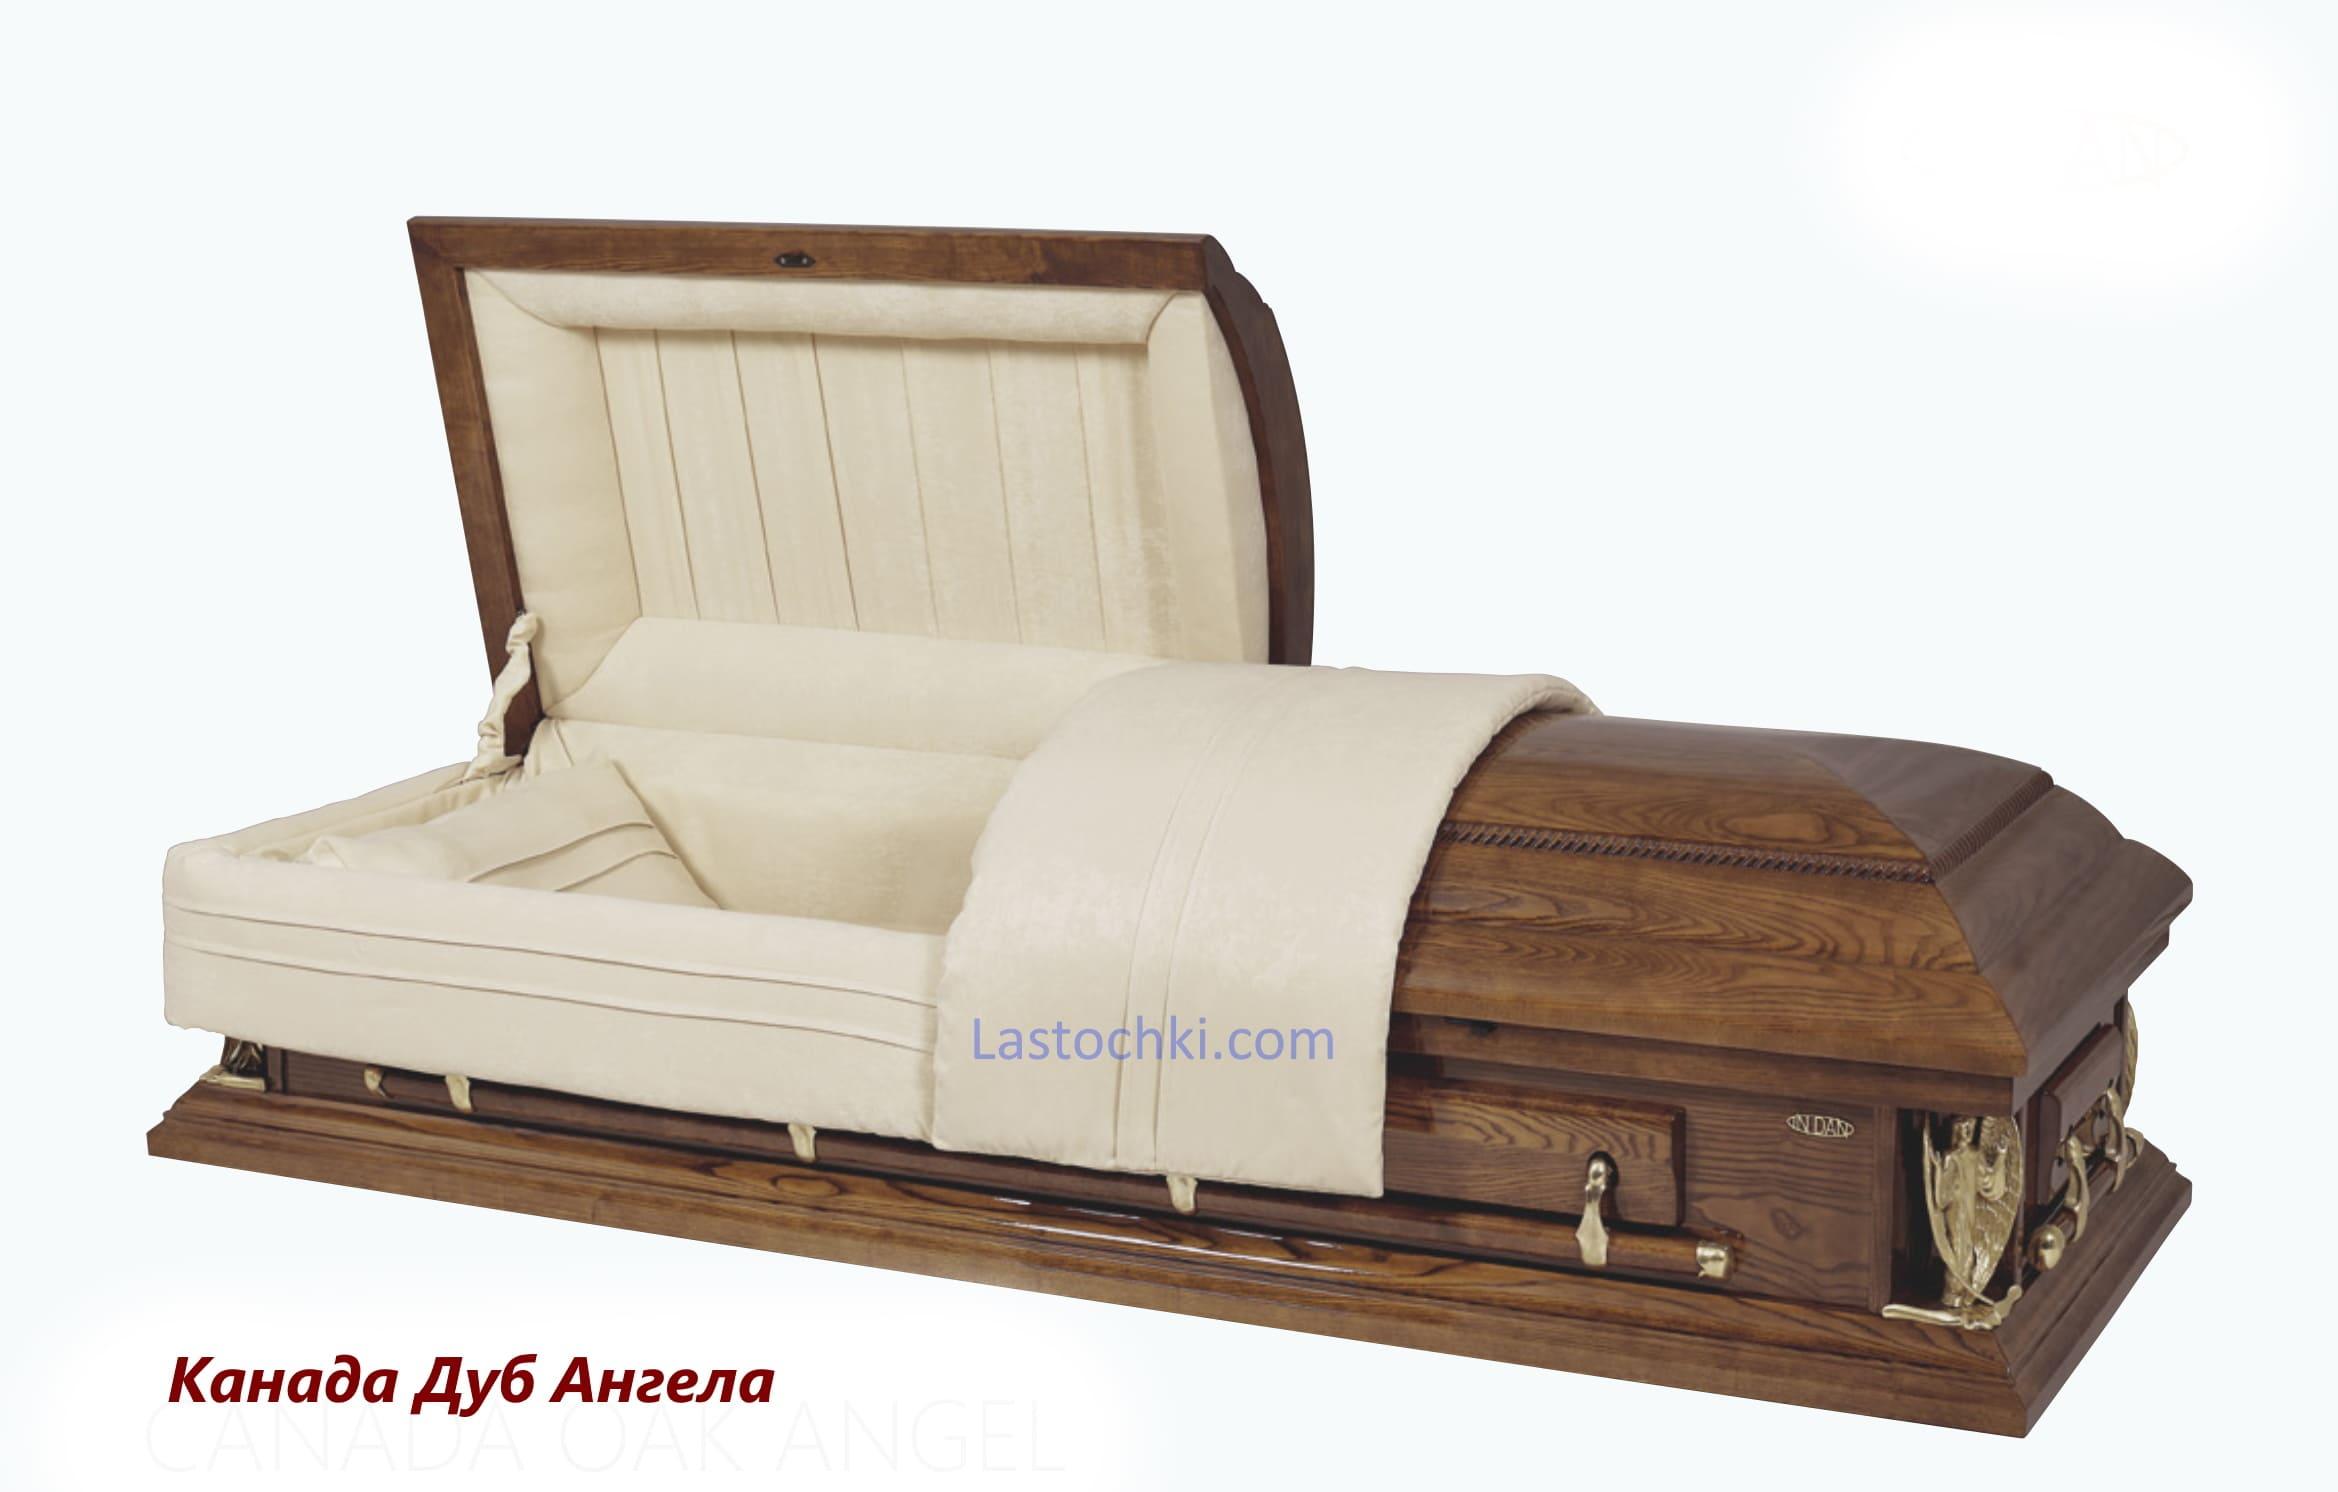 Саркофаг Канада Дуб Ангел  -  Цена 112 000 грн.